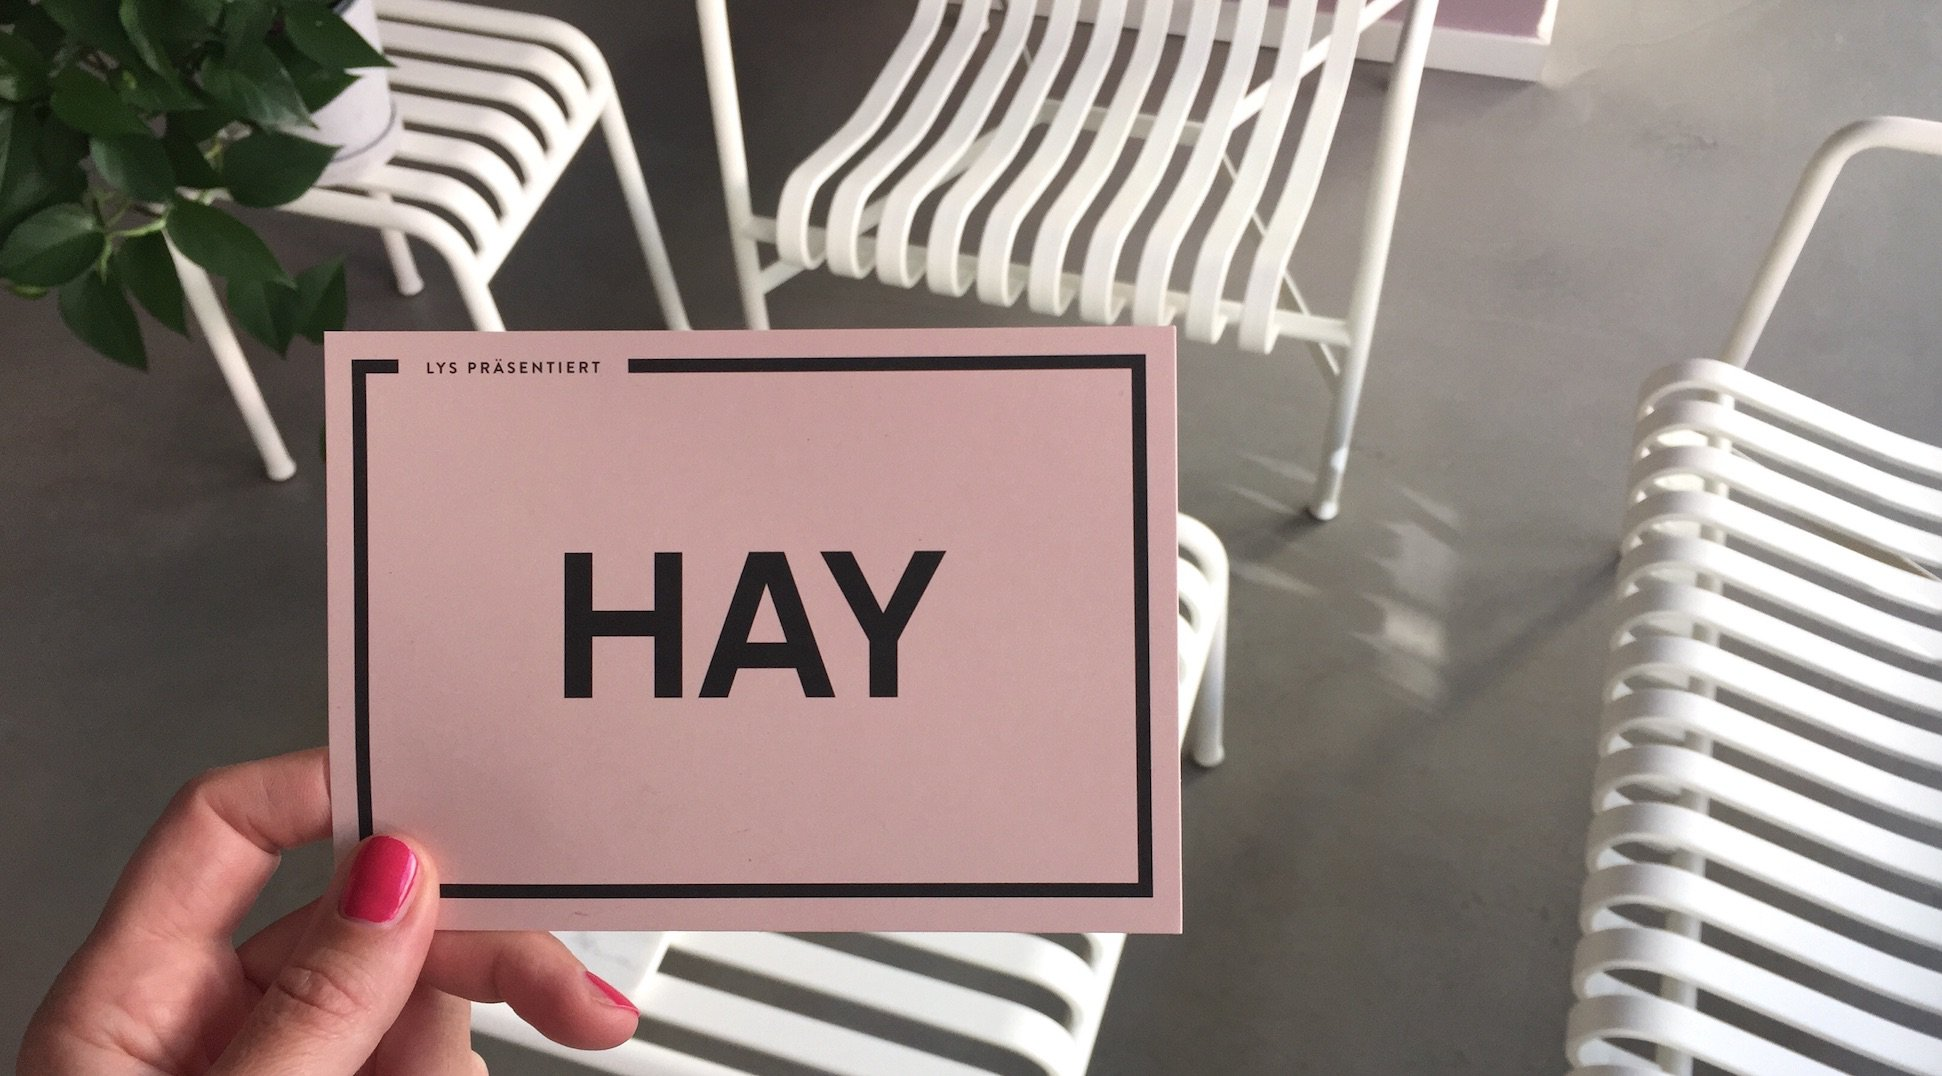 hay-stylistentage.jpg__1942x1076_q85_subsampling-2